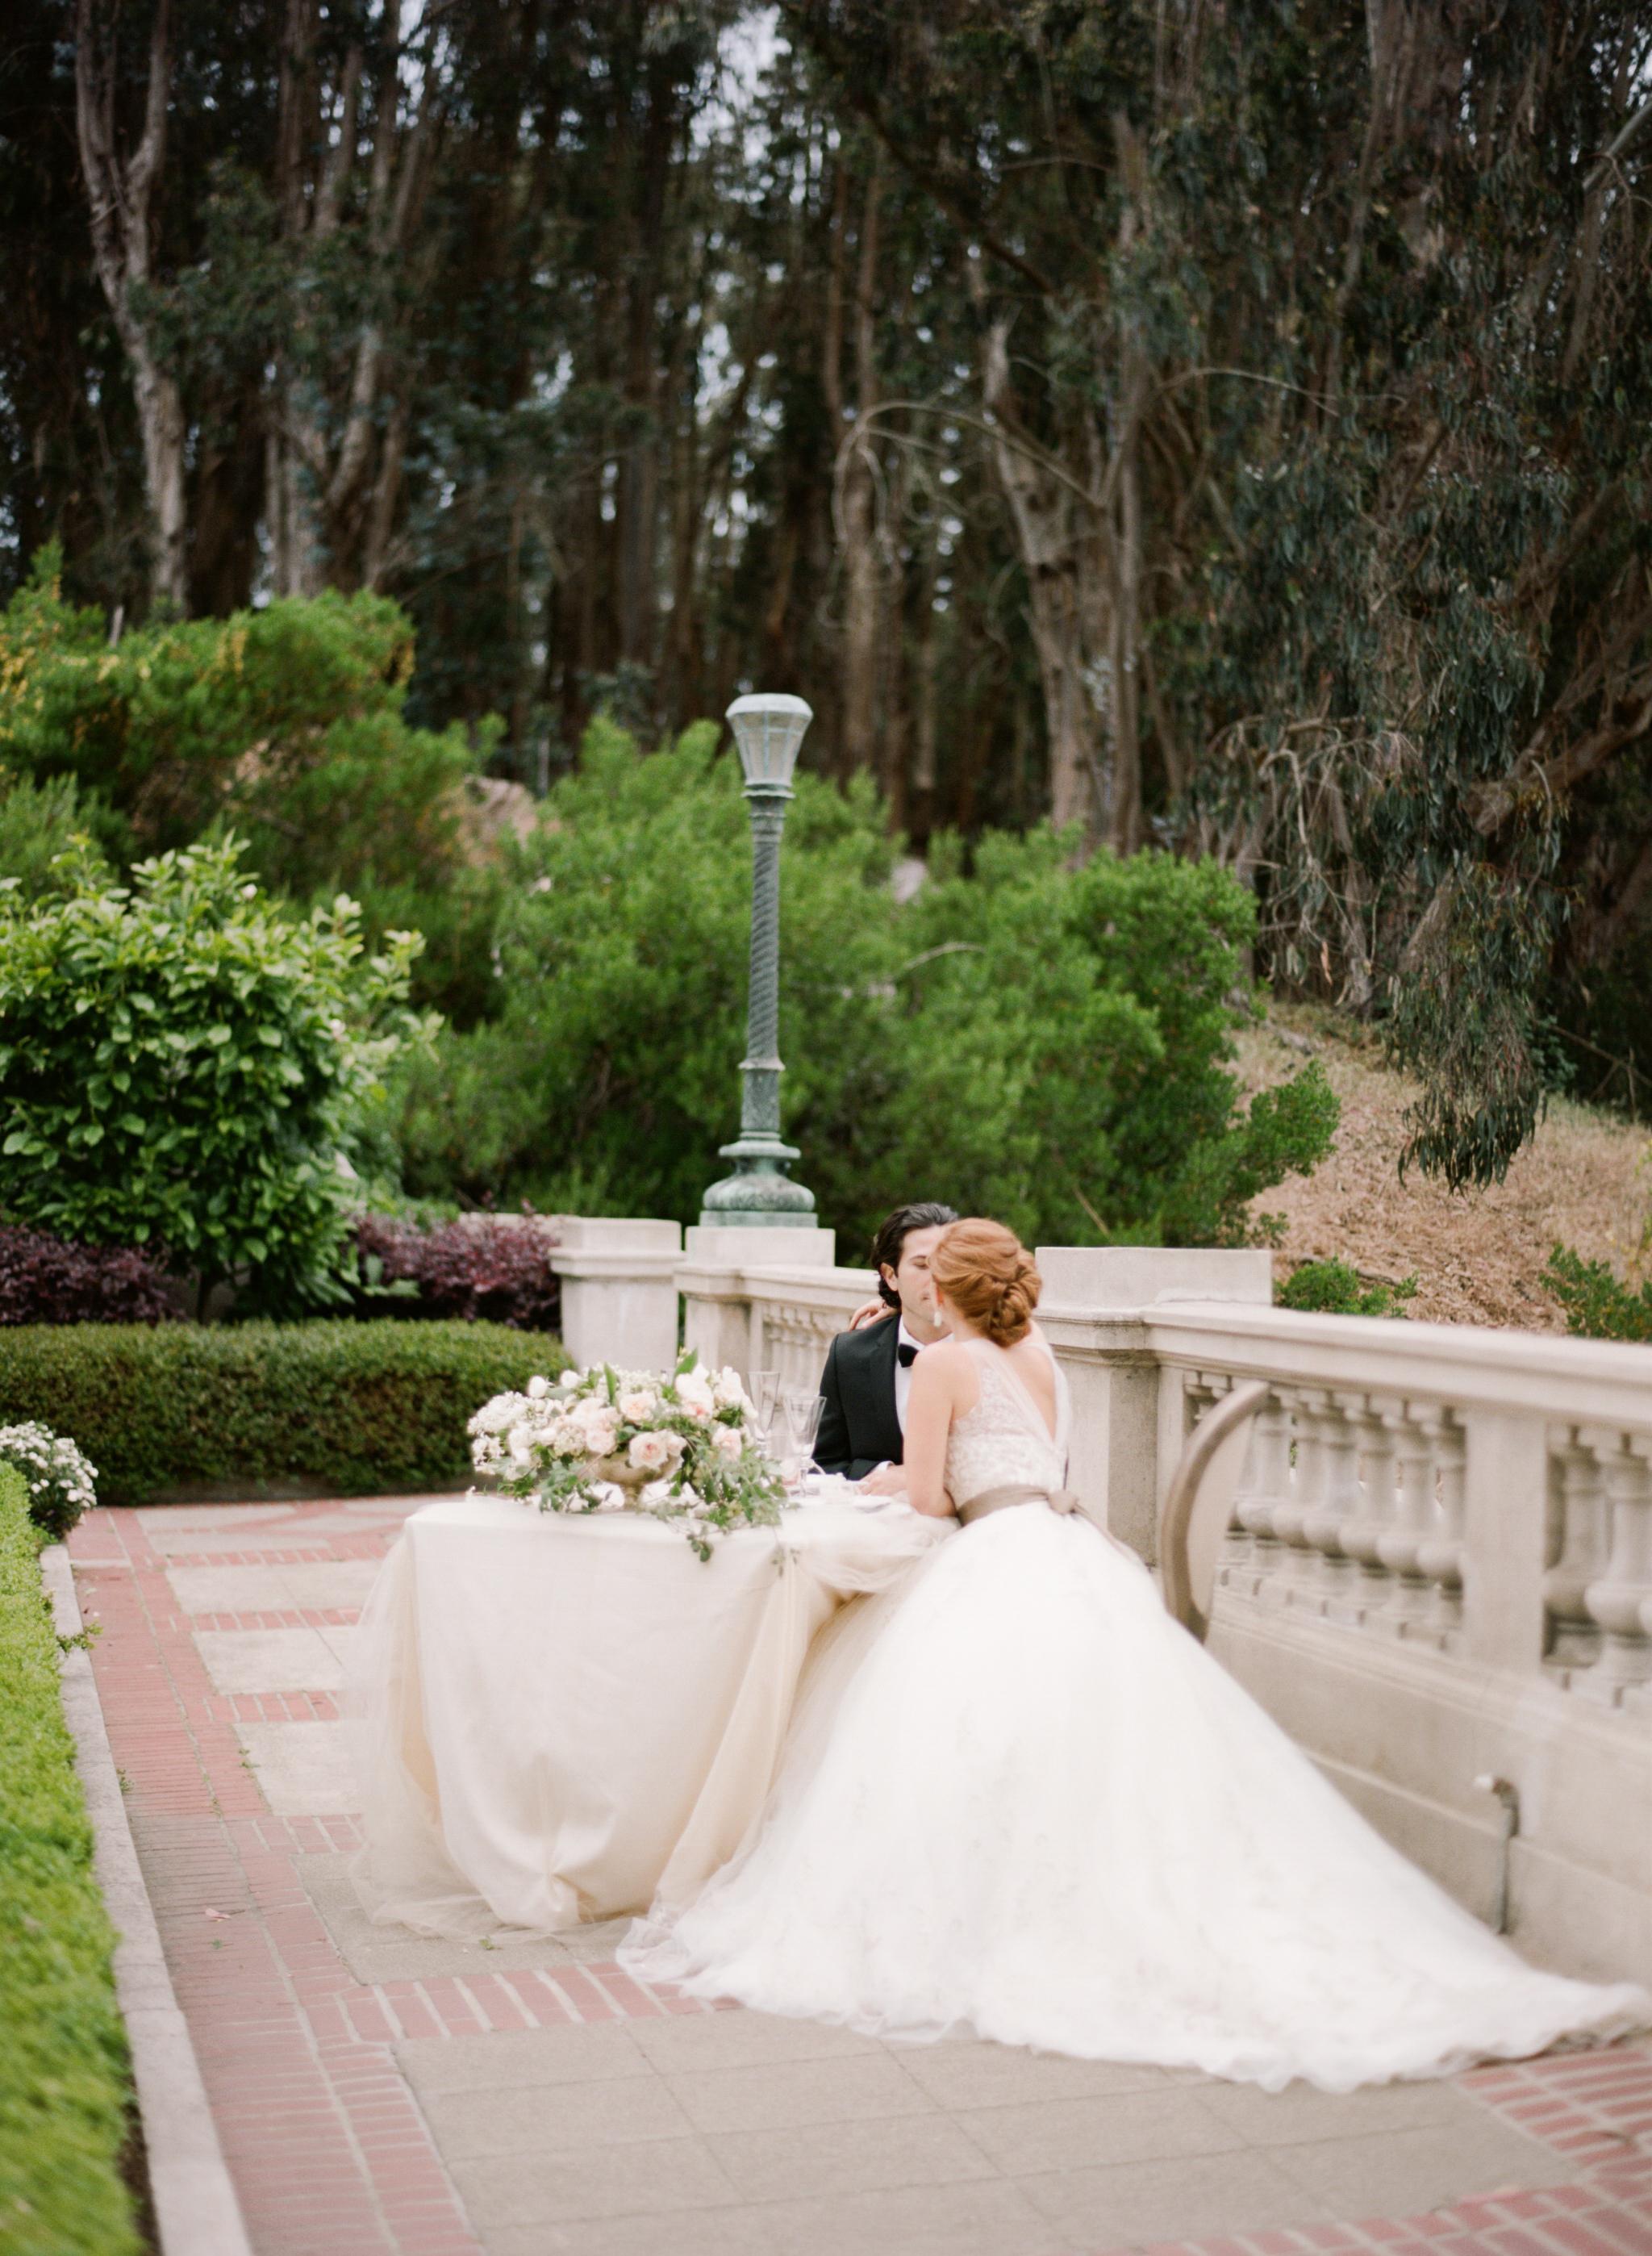 086-80930006SylvieGil-Paris-macaroons-red hair bride-romantic wedding-french wedding.jpg